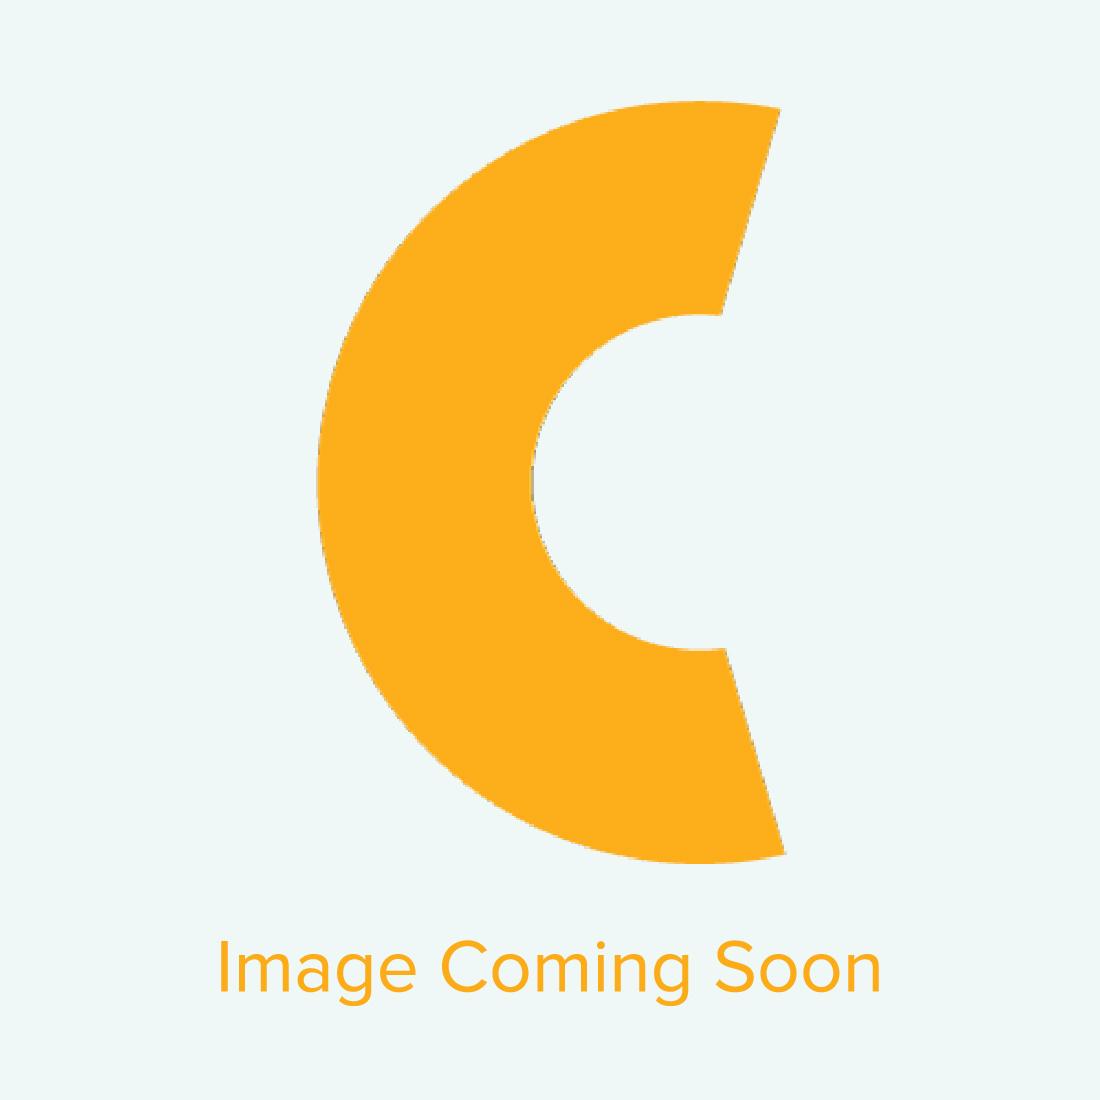 "5"" x 7"" Hardboard Sublimation Photo Panels with Kickstand – 20/case"